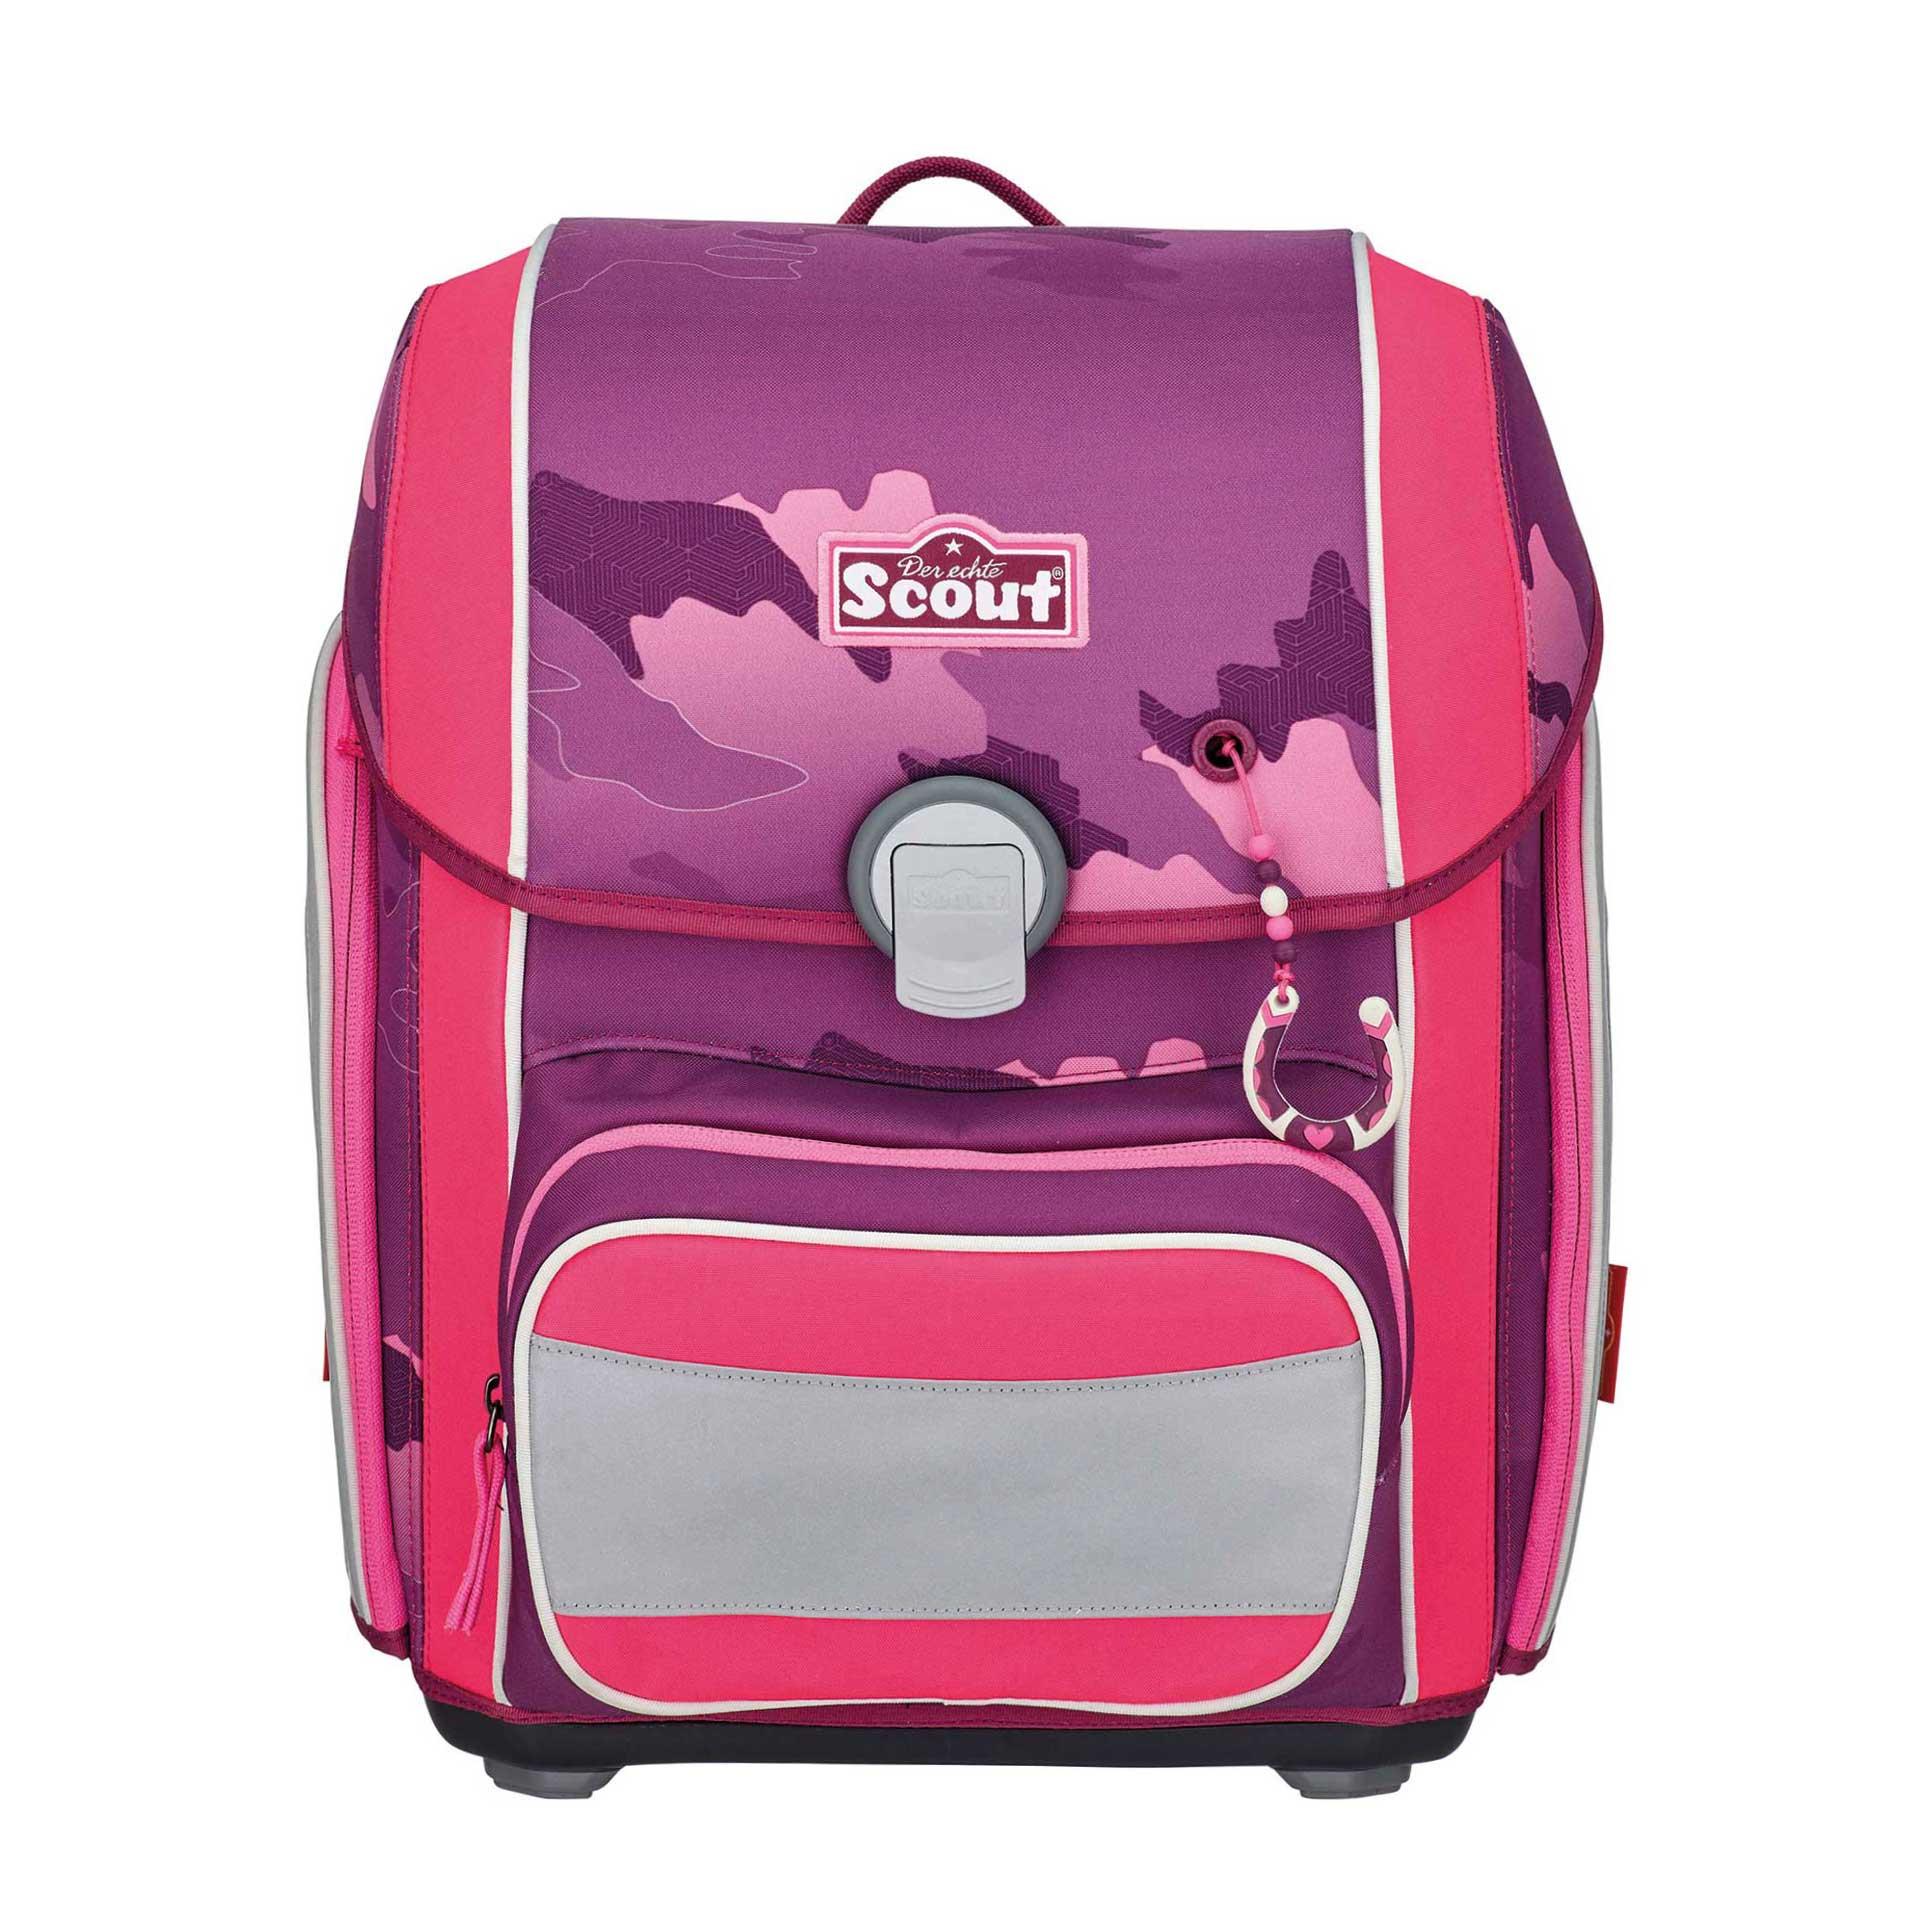 Scout Genius Schulranzenset 4-teilig inkl. 3 Funny Snaps Pink Horse